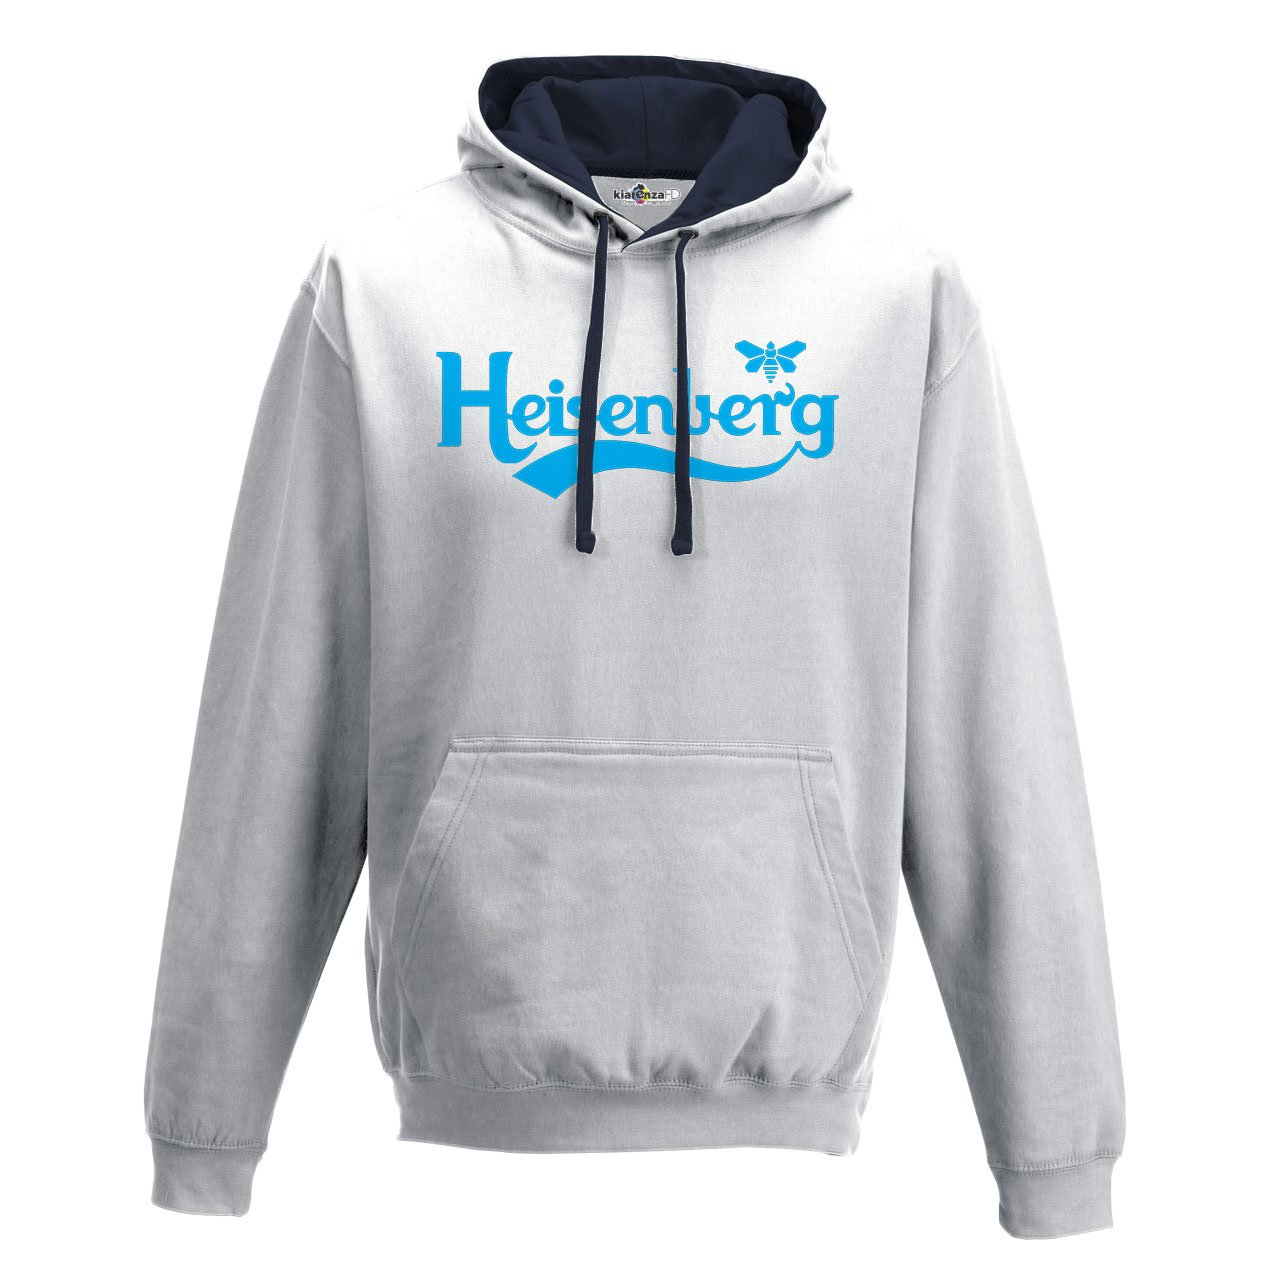 KiarenzaFD Sudadera Capucha Bi Breaking Bad Parodia Heisenberg Cerveza 1 Streetwear: Amazon.es: Ropa y accesorios